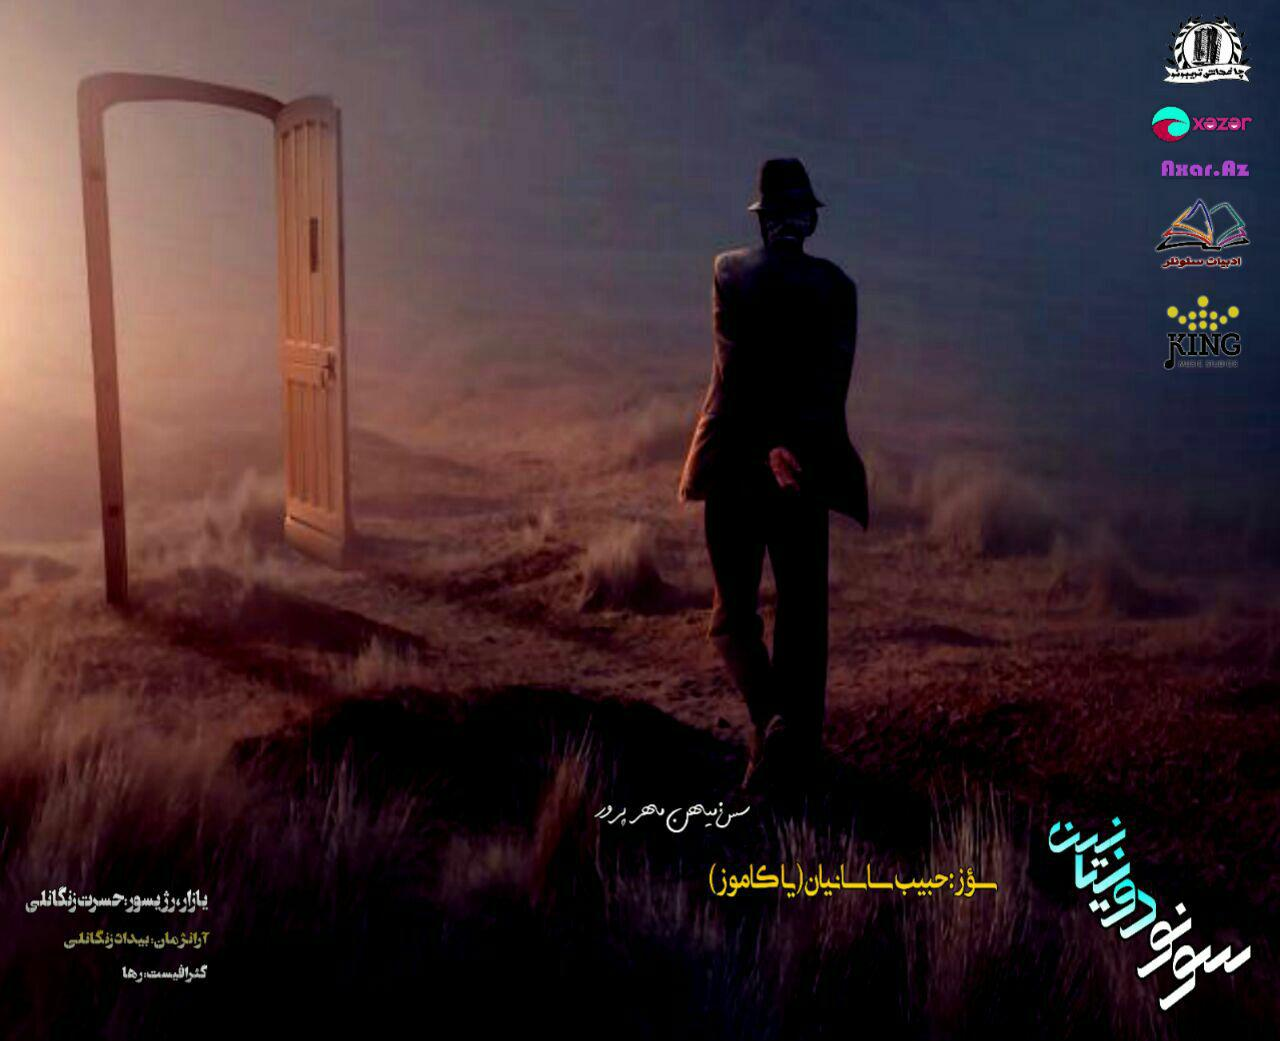 http://s9.picofile.com/file/8334785242/16Mihan_Mehrparvar_Sonu_Dunyanin.jpg